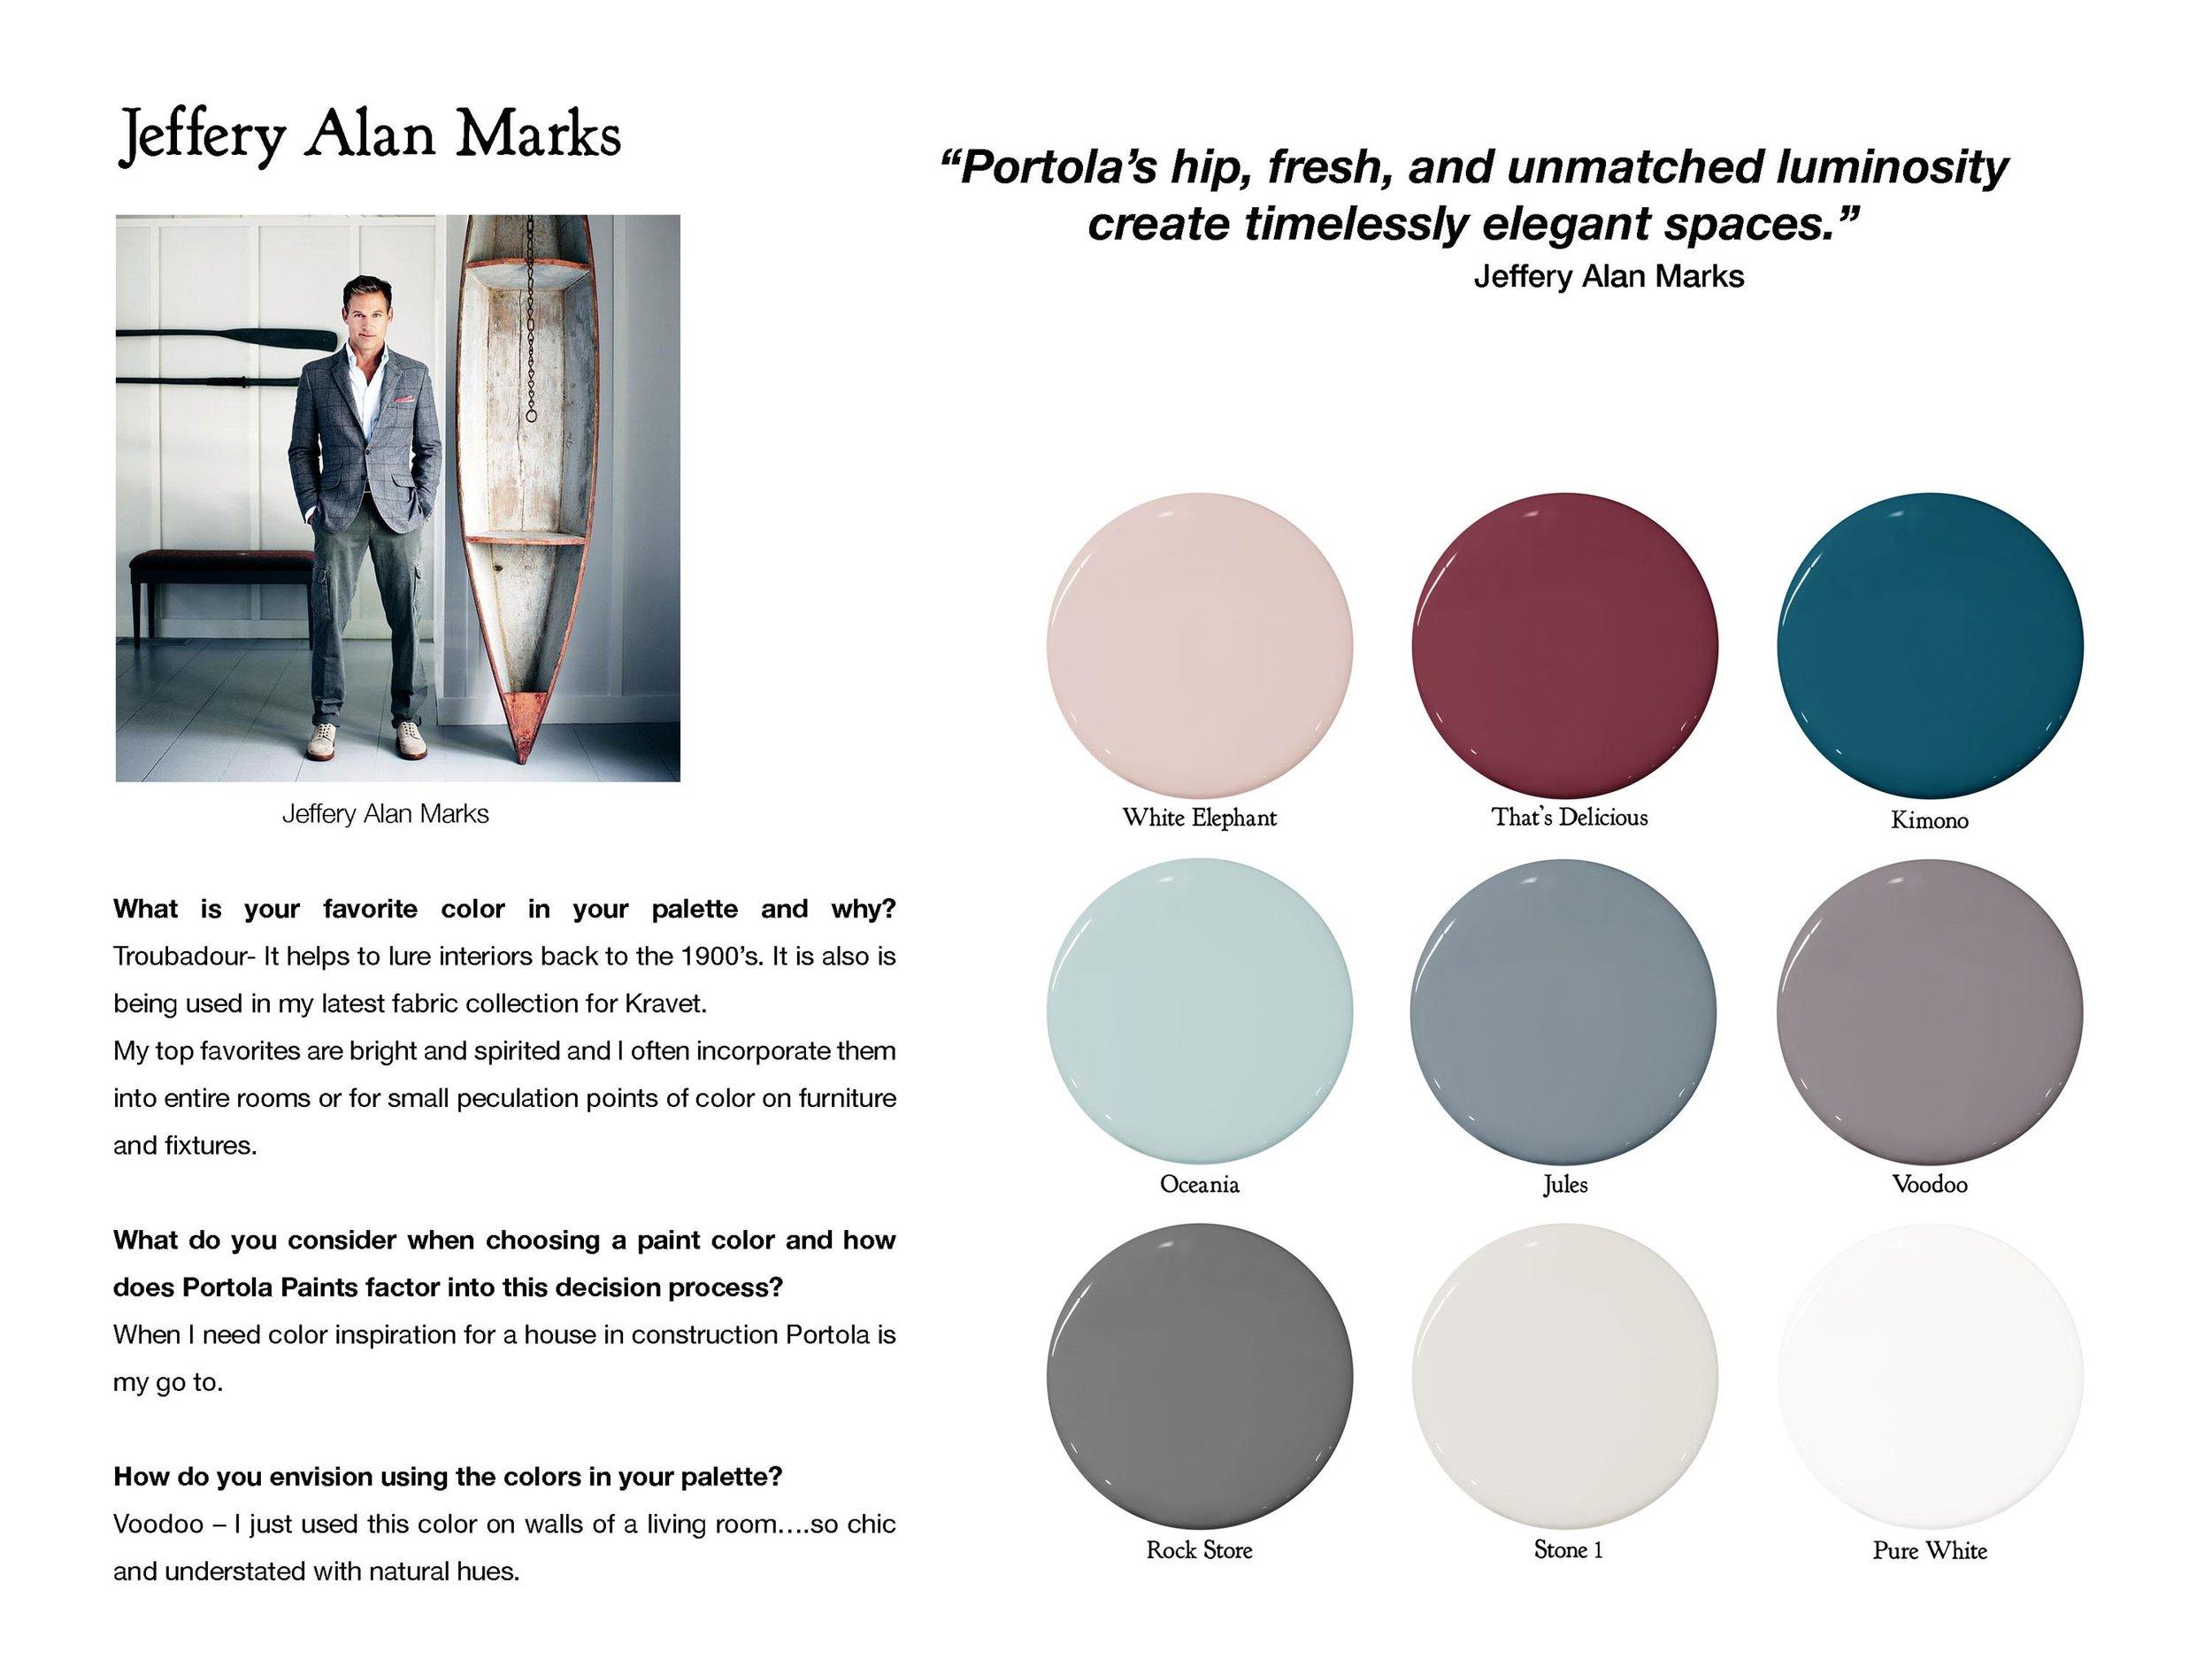 Follow Jeffrey Alan Marks:  jam-design.com ,  instagram.com/jeffreymarksinc   Color Picks:  White Elephant ,  That's Delicious ,  Kimono ,  Oceania ,  Jules ,  Voodoo ,  Rock Store ,  Stone 1 ,  Pure White